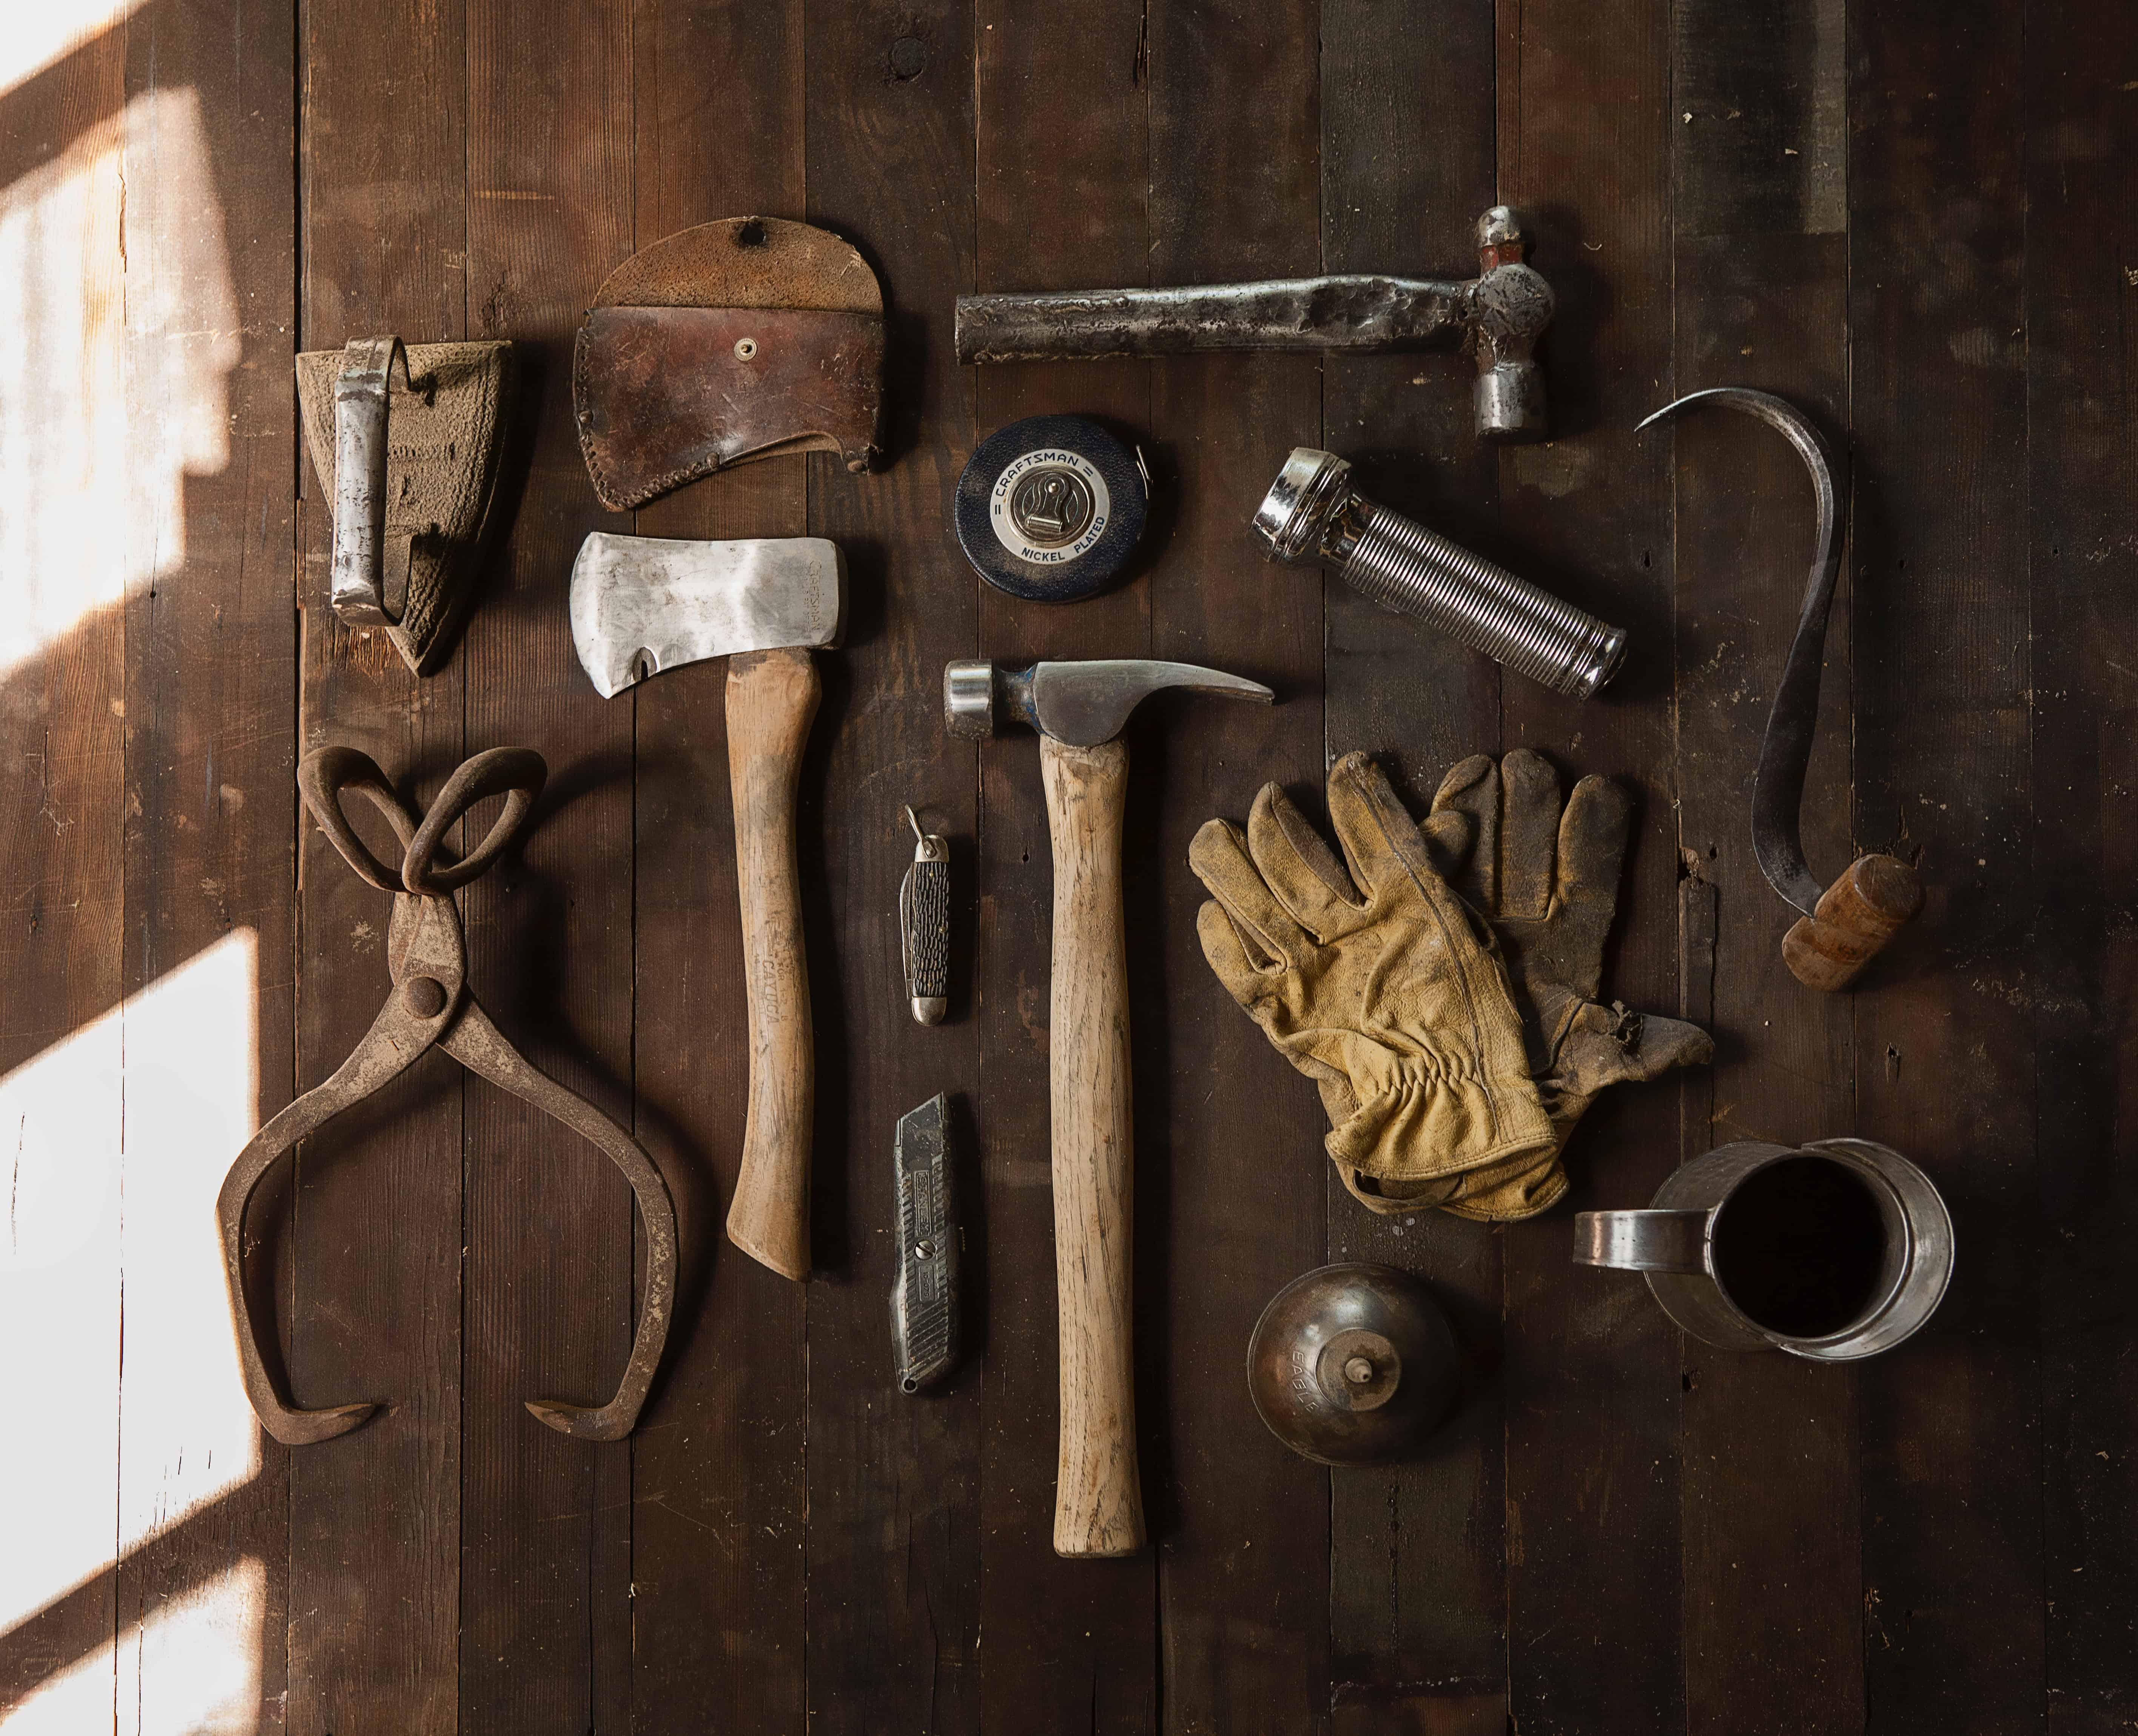 Top 5 Laravel Tools - PHP Development cover image